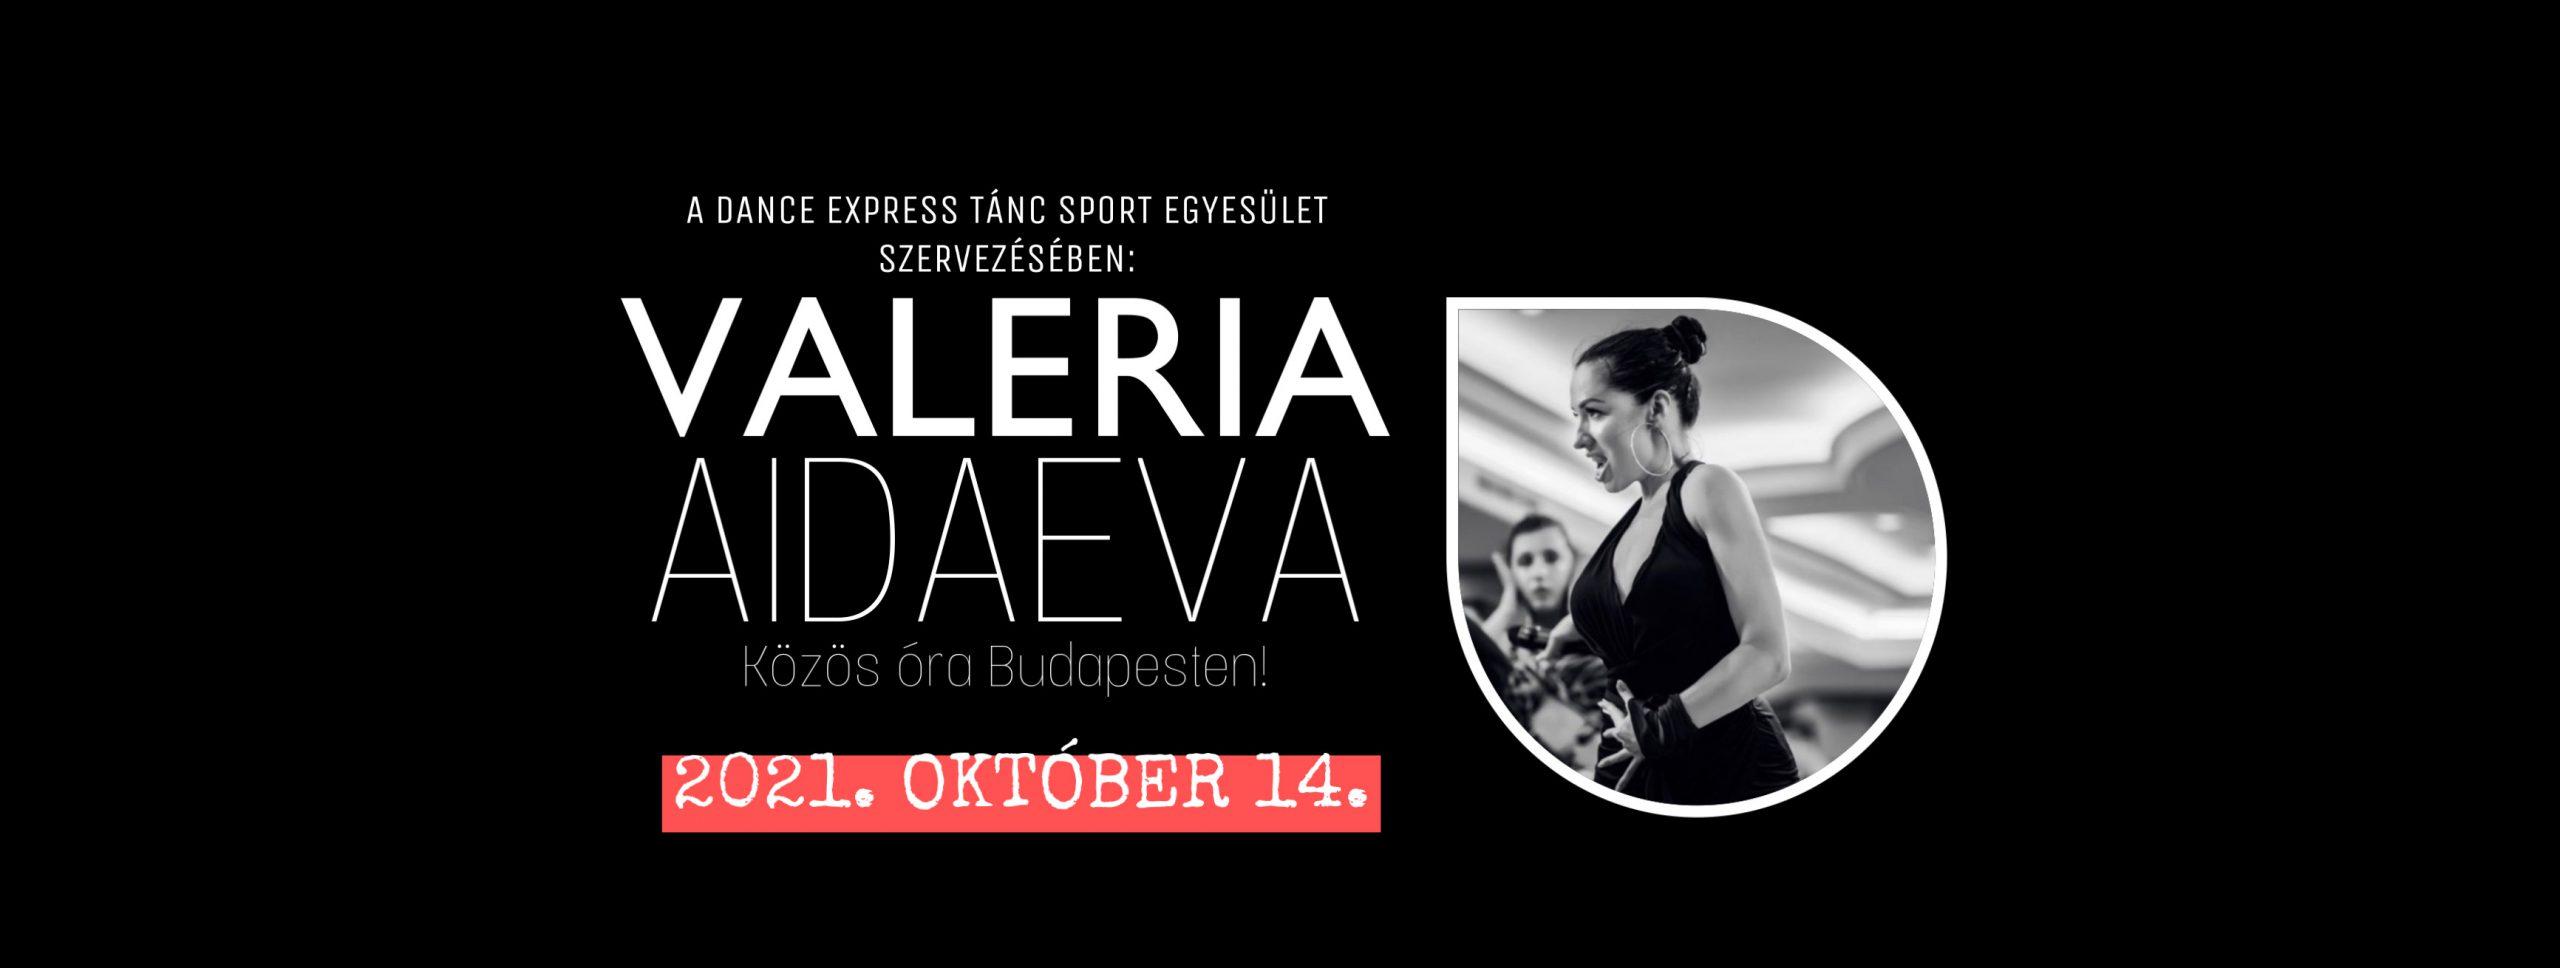 Valeria Aidaeva Budapestre látogat!